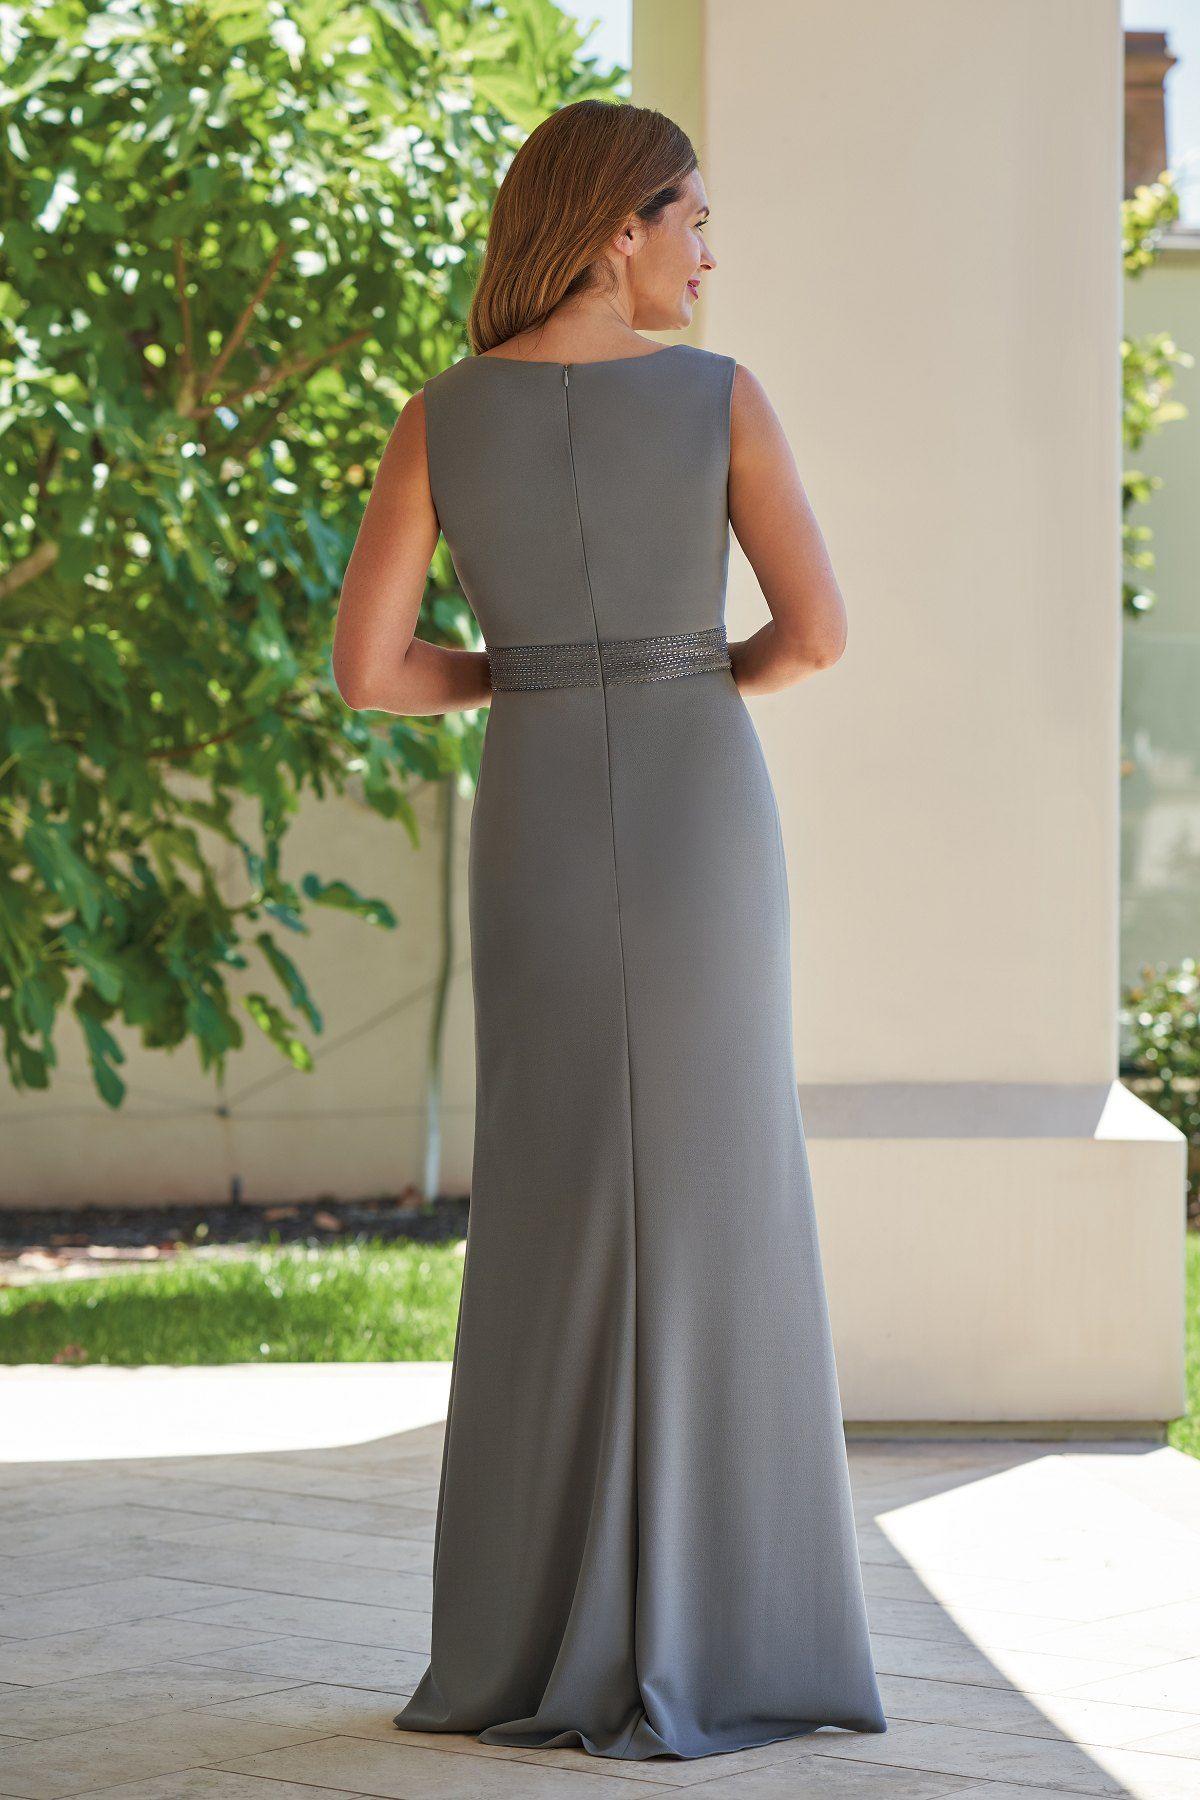 d81247a4be2 J215009 Stretch Crepe   Jade Tiffany Chiffon MOB Dress with V-Neckline